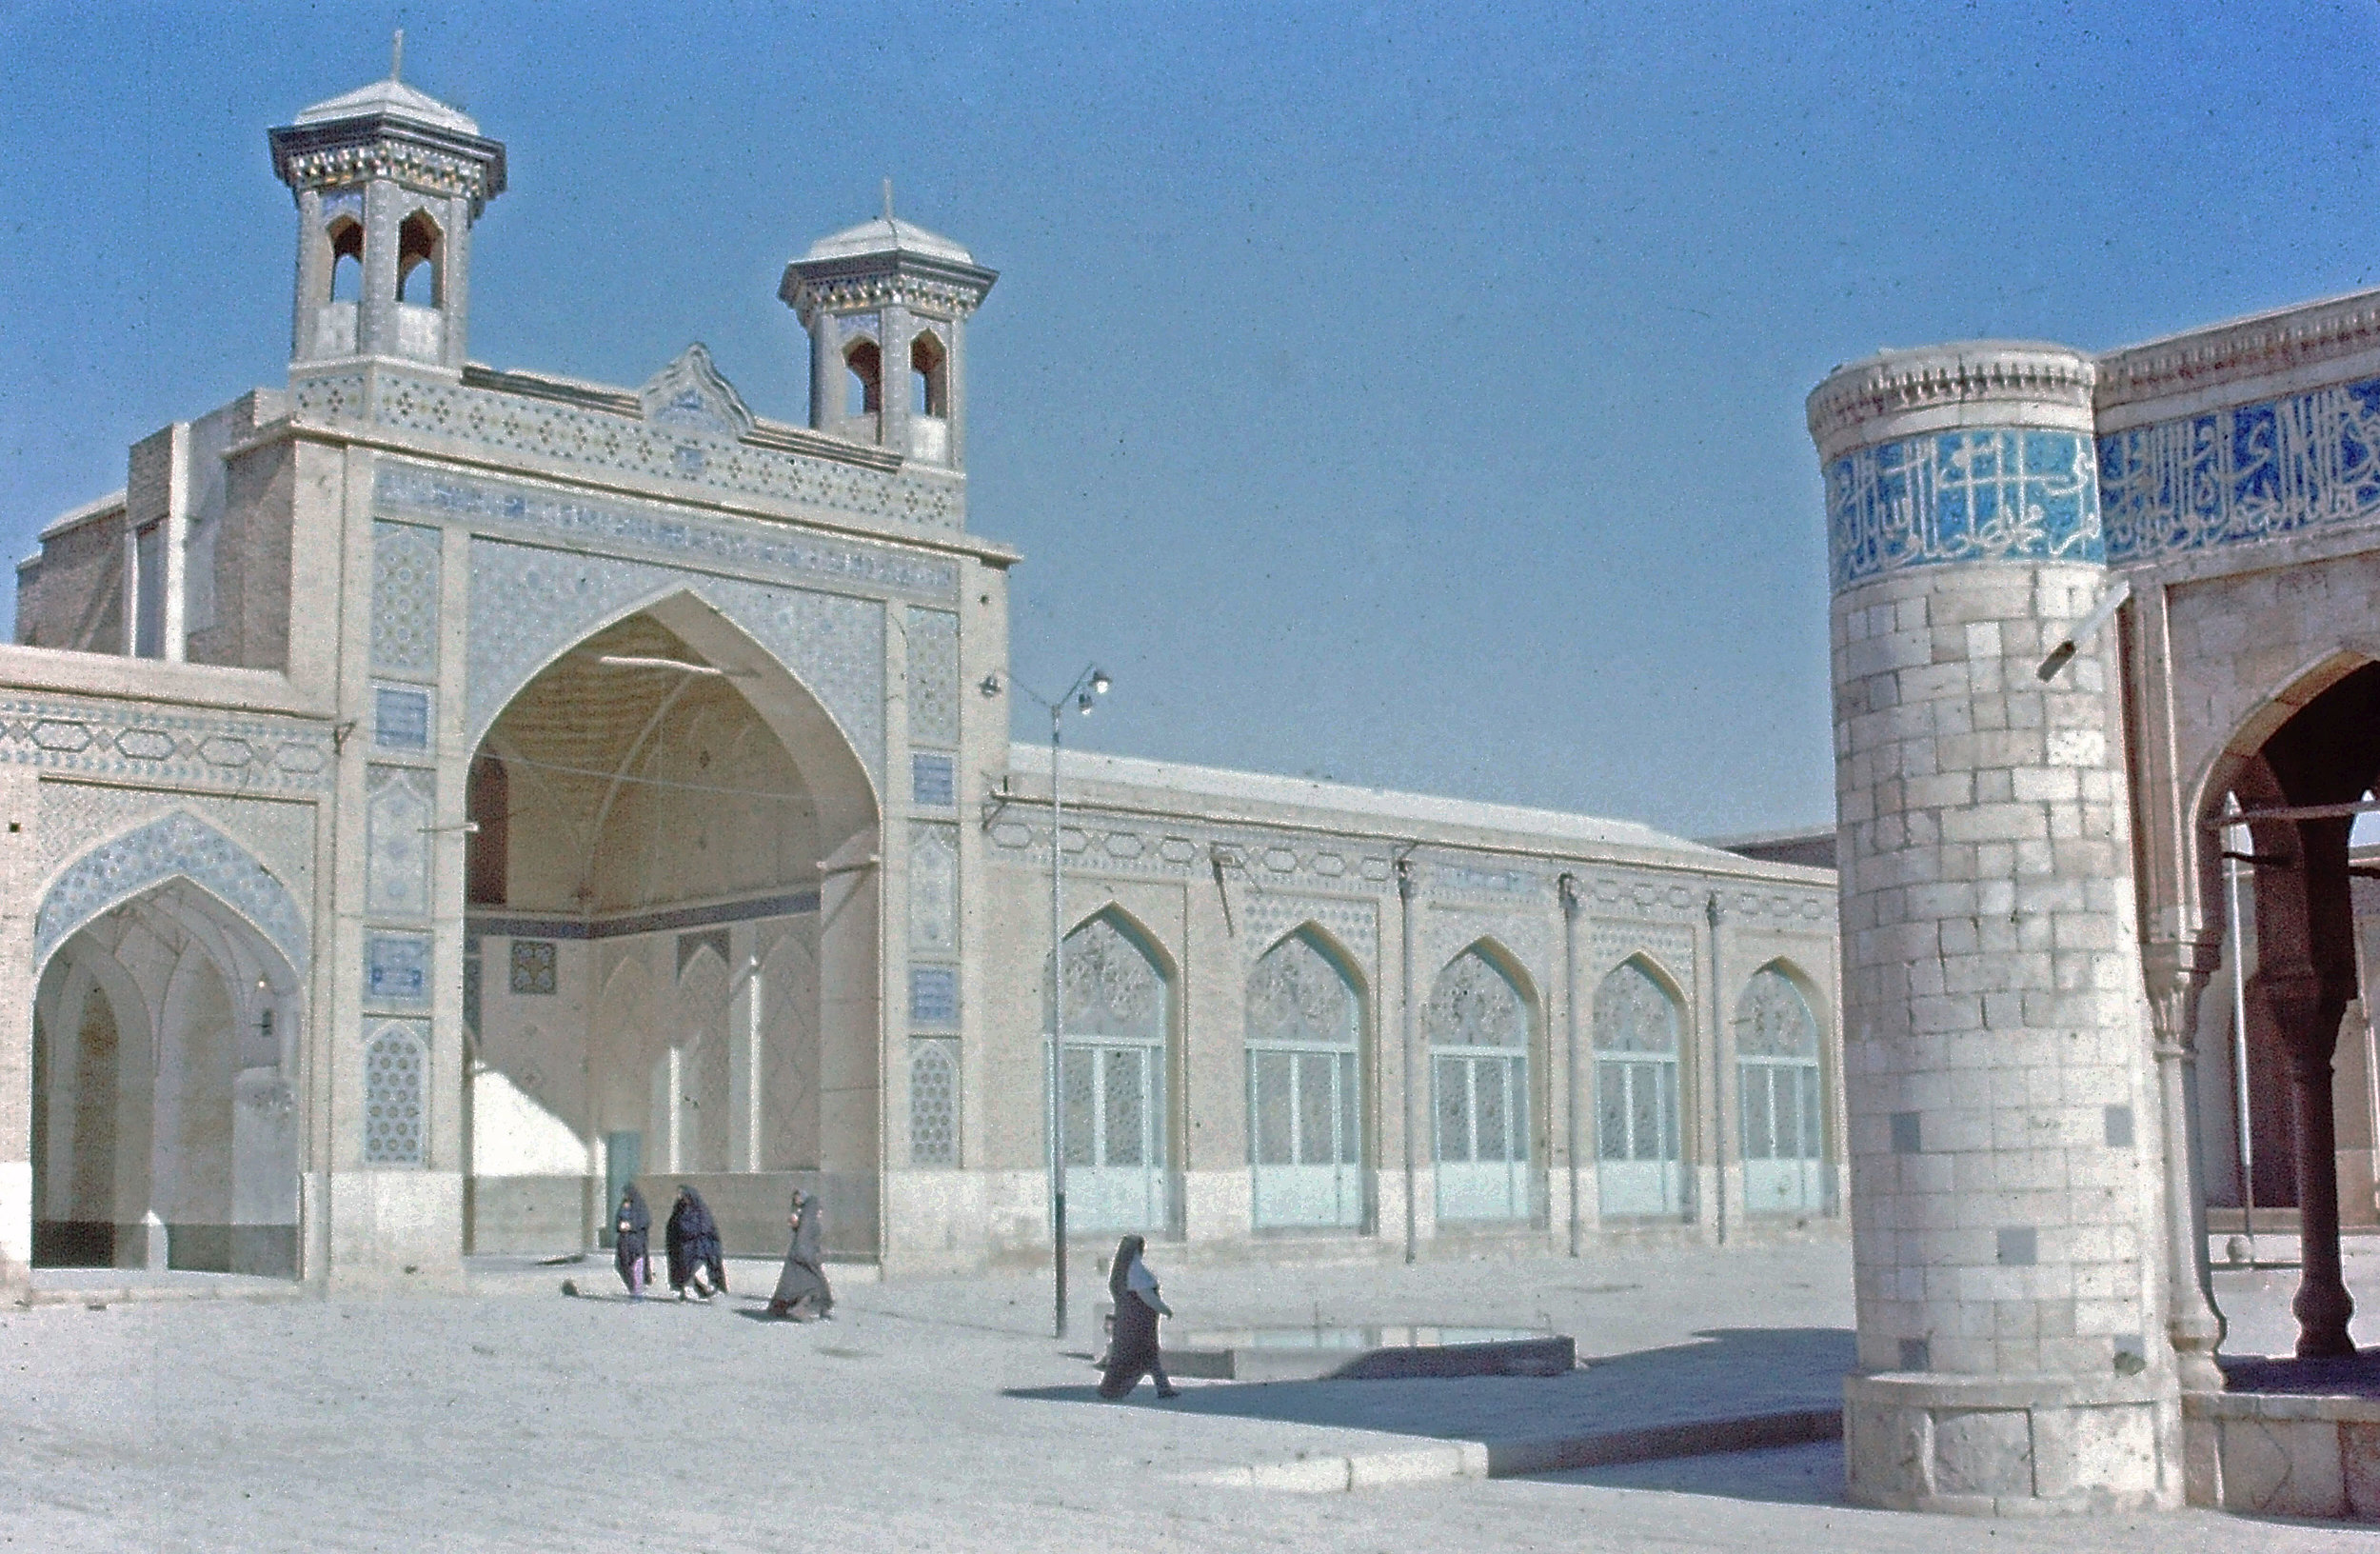 Shiraz Old Friday Mosque